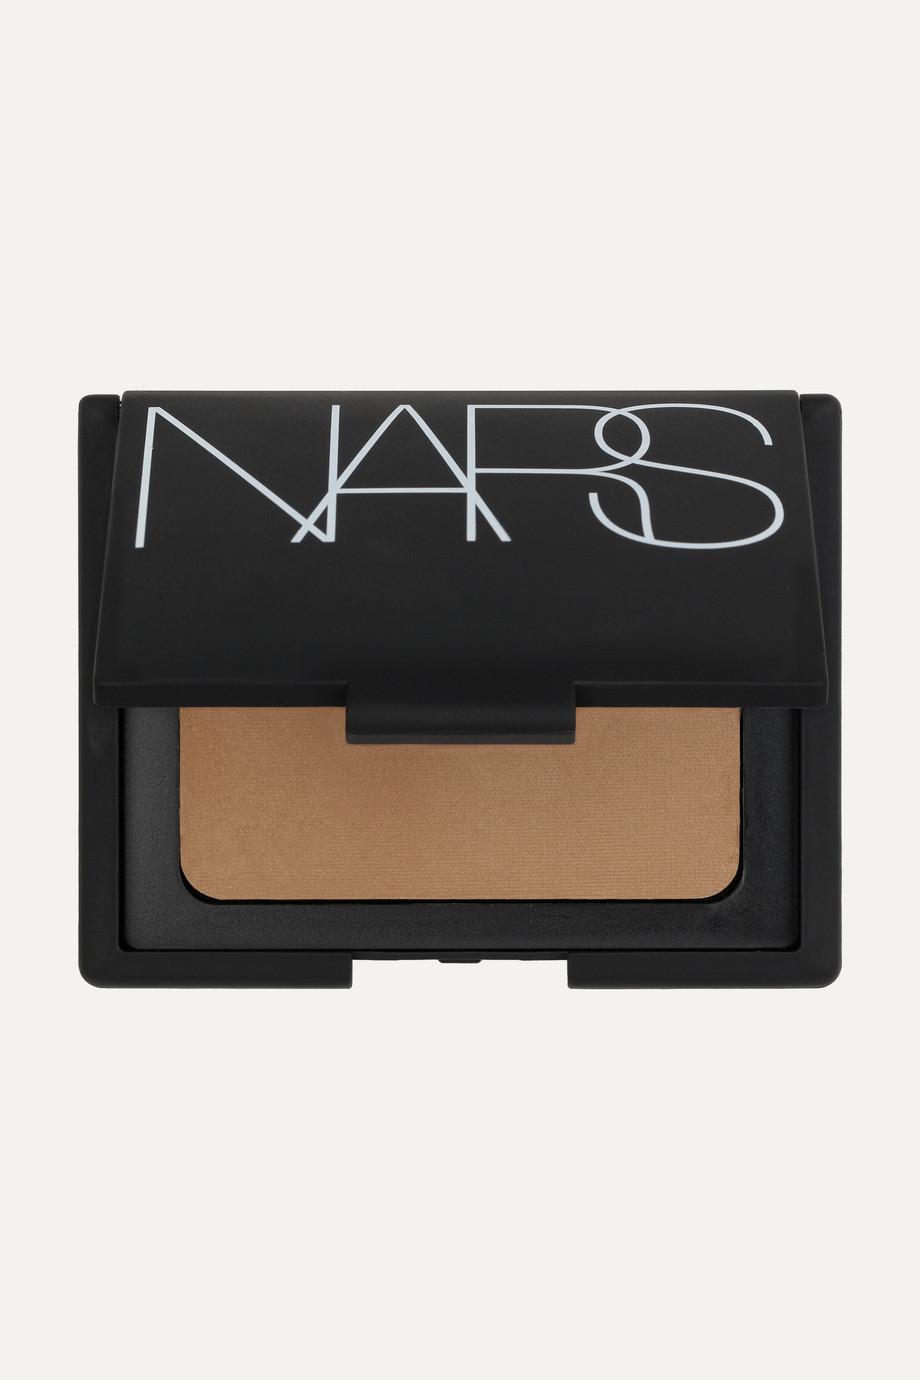 NARS Bronzing Powder - Laguna